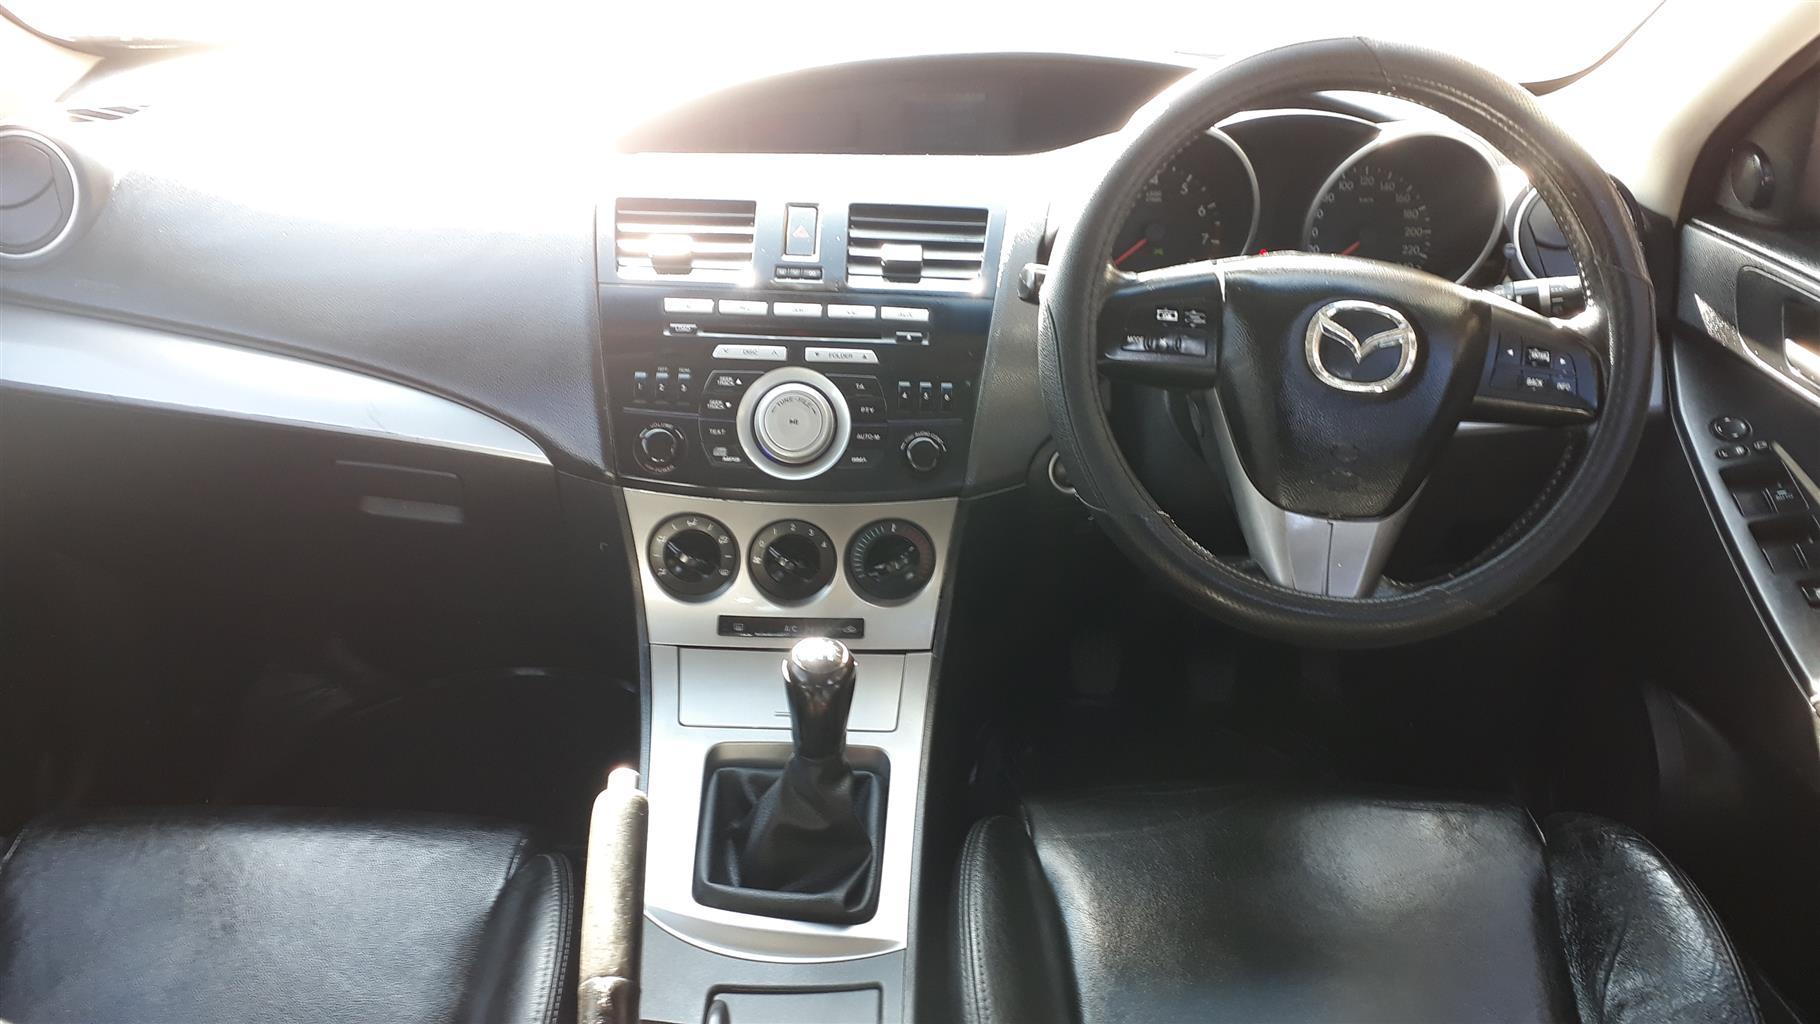 2011 Mazda Mazda3 sedan MAZDA3 1.5 INDIVIDUAL